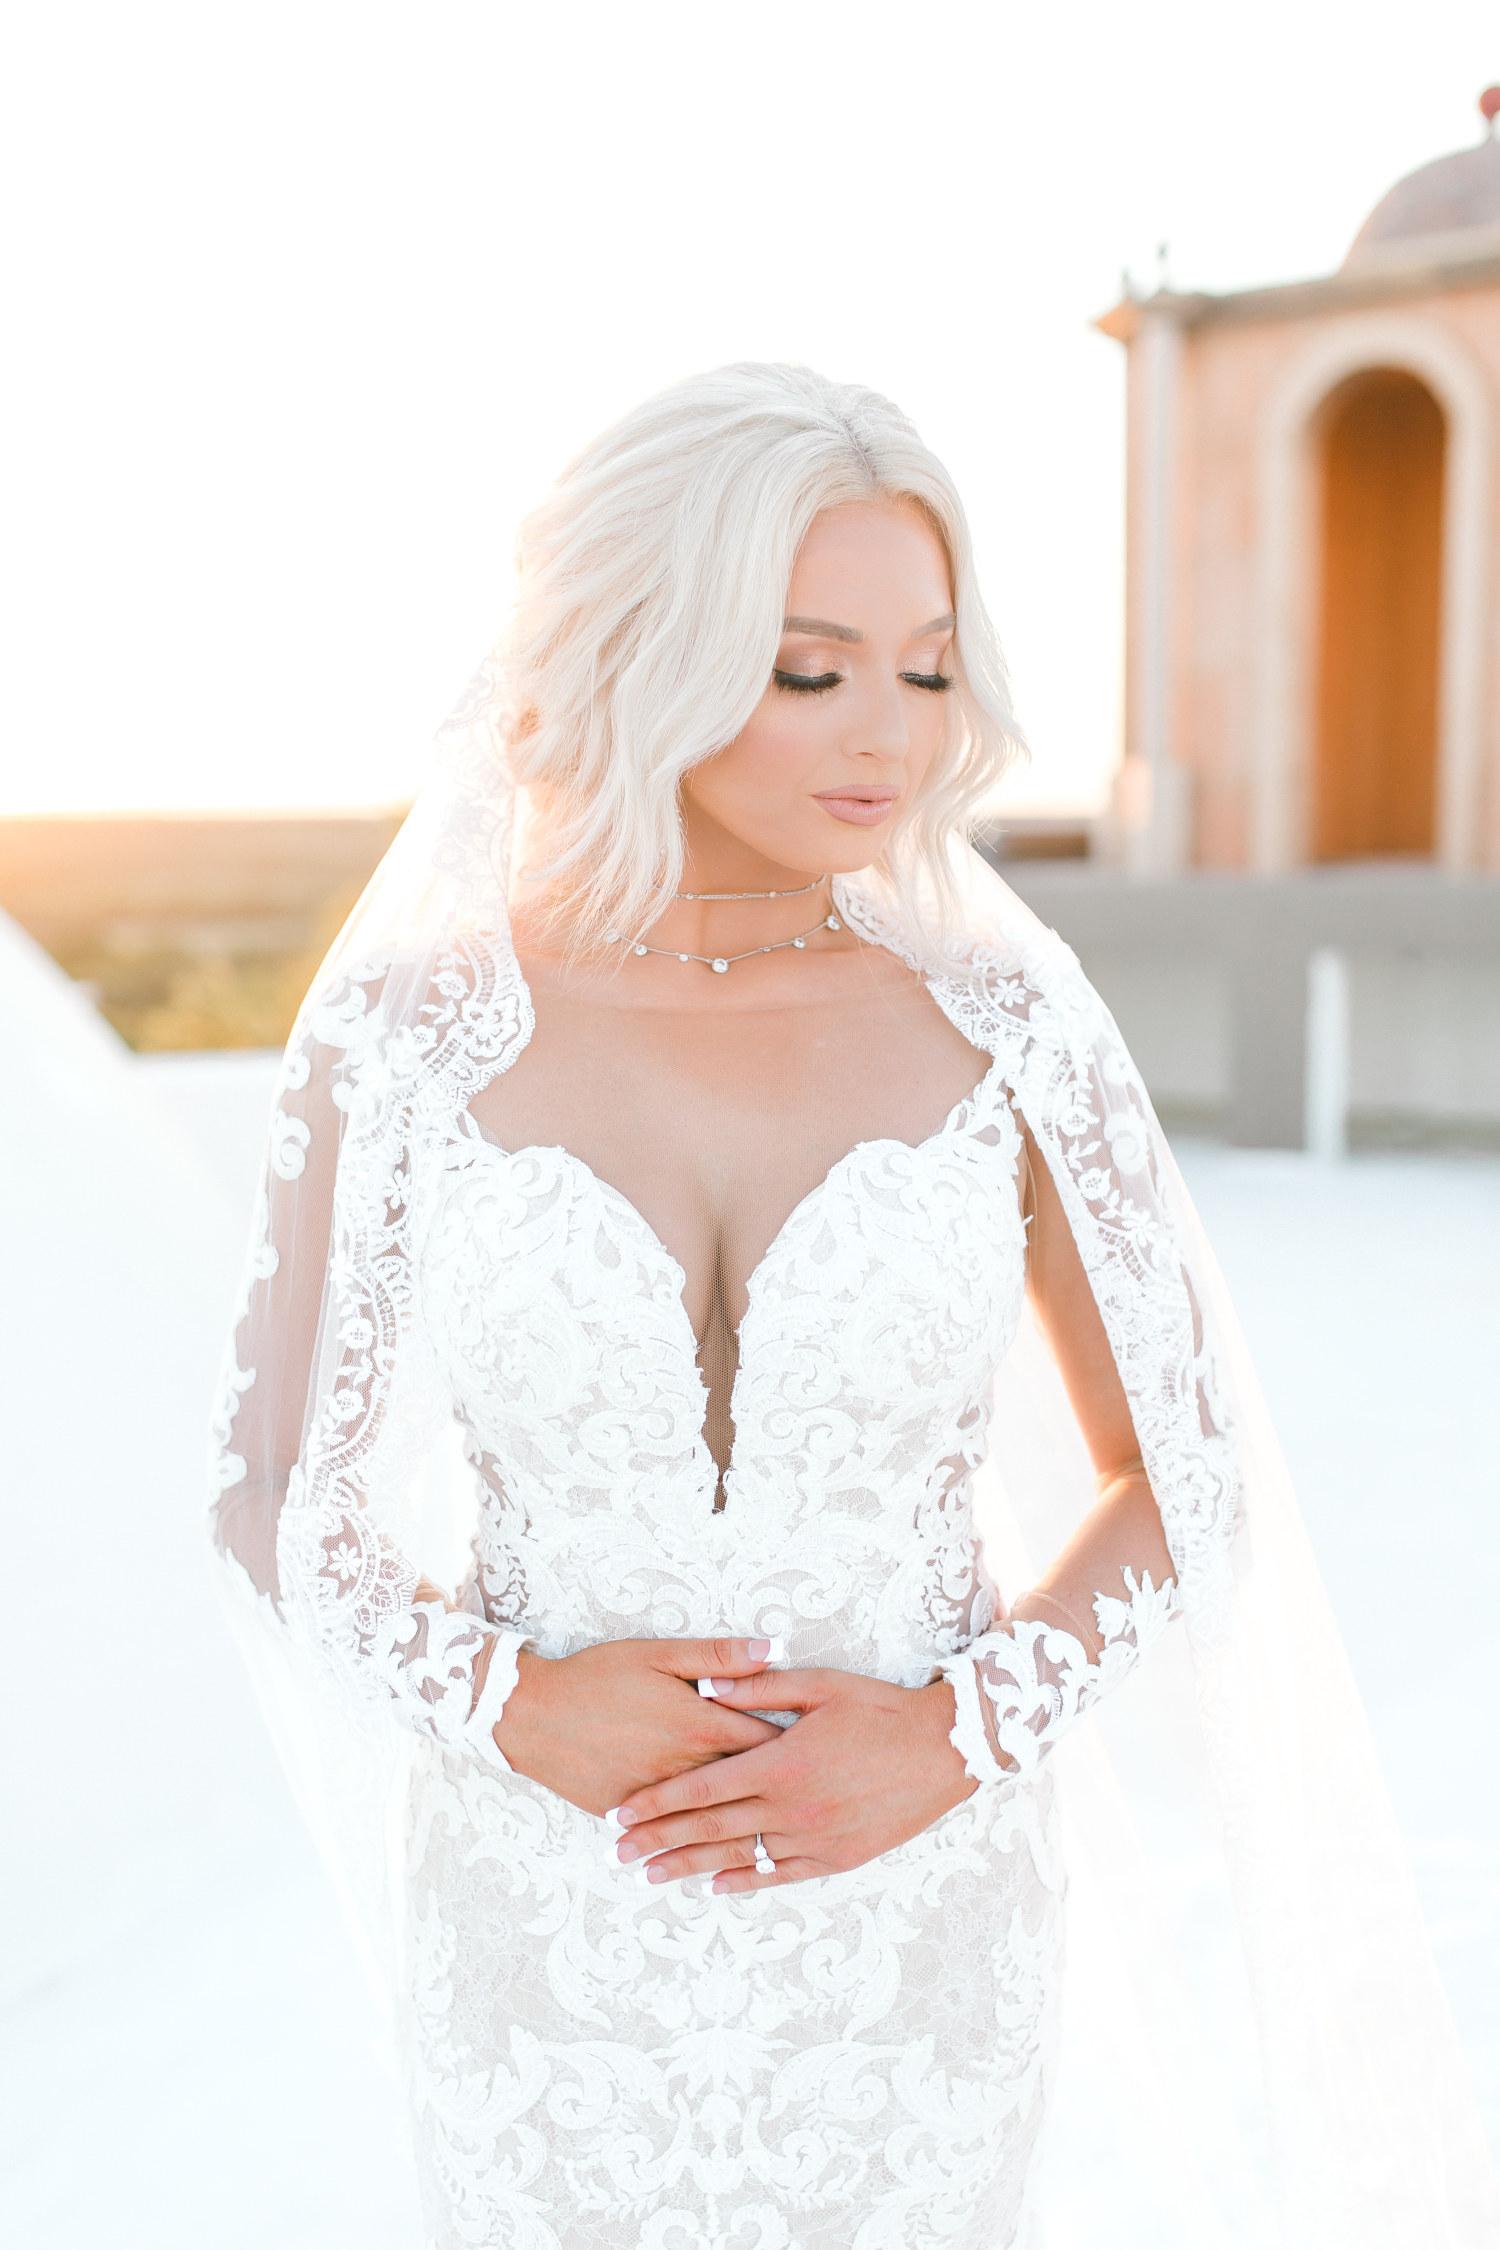 Bridal session, Hannah Way Photography, stoney ridge villa, Dallas wedding photographer, dfw wedding photographer, luxury wedding, luxury wedding photographer, wedding dress with sleeves, lace wedding dress